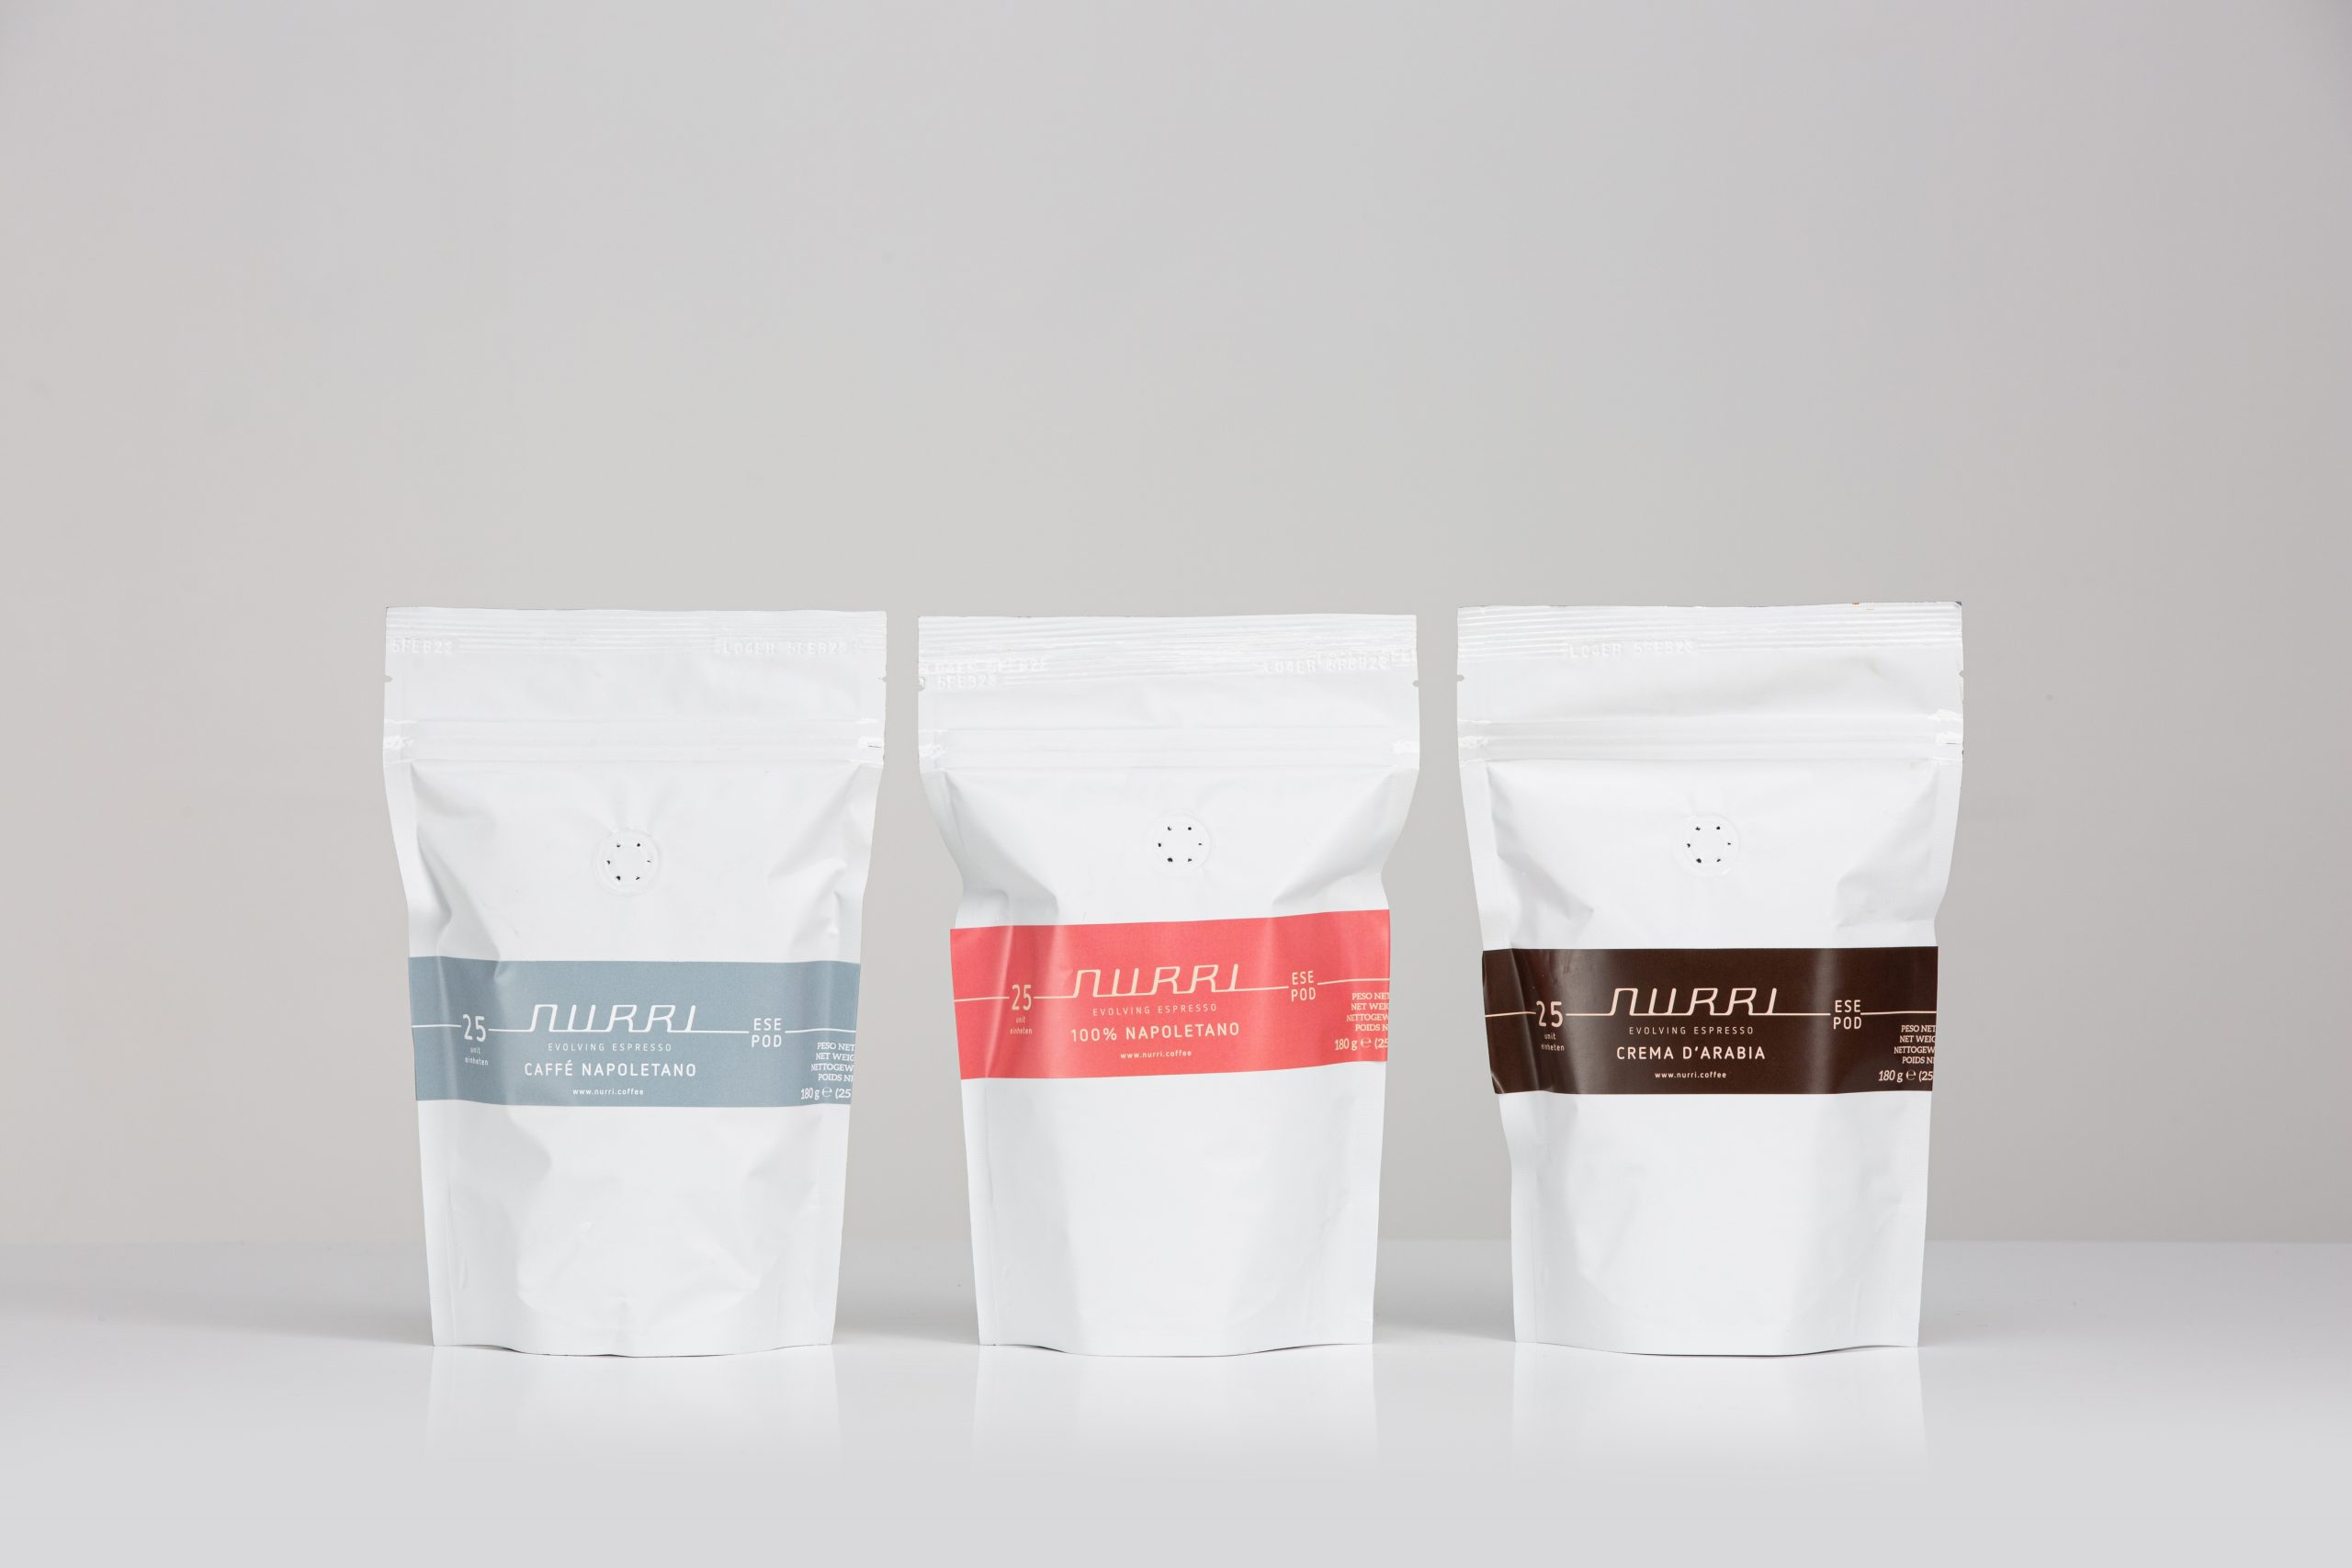 Nurri coffee blends napoletano arabia ESE POD 180g